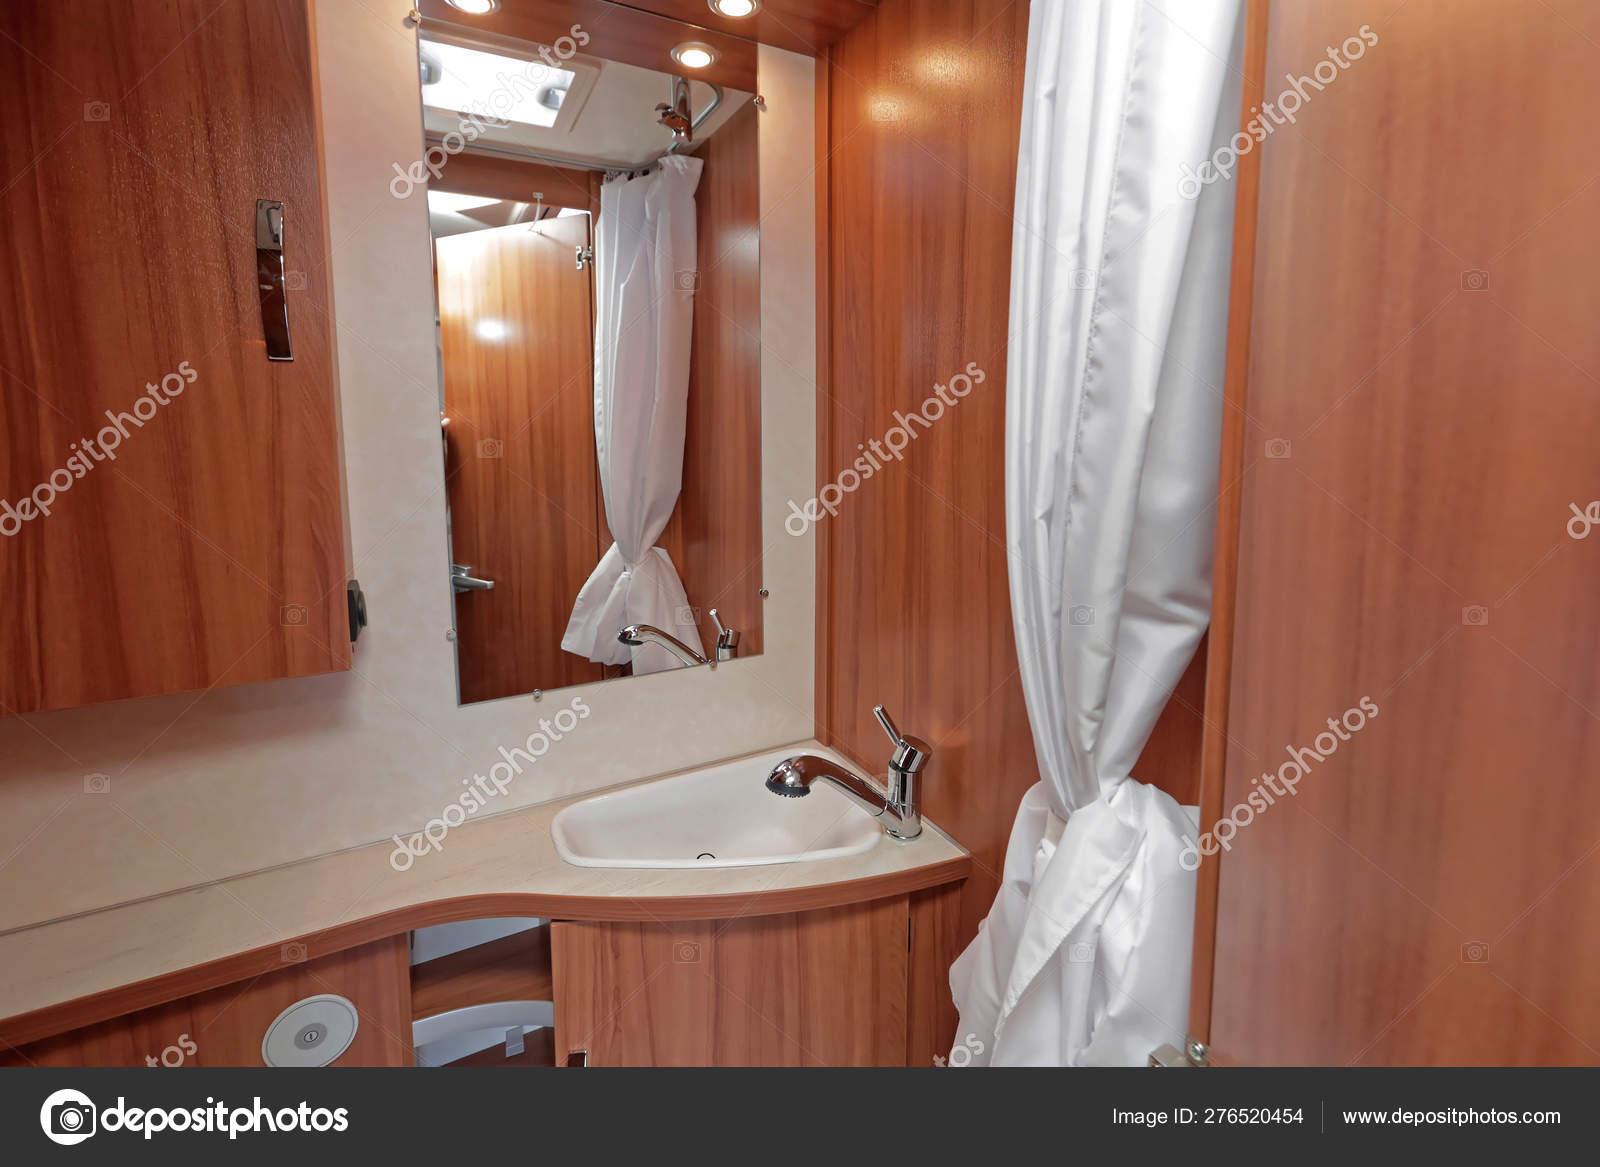 Lavabo Caravana.Bano Completo De Caravana Foto De Stock C Baloncici 276520454